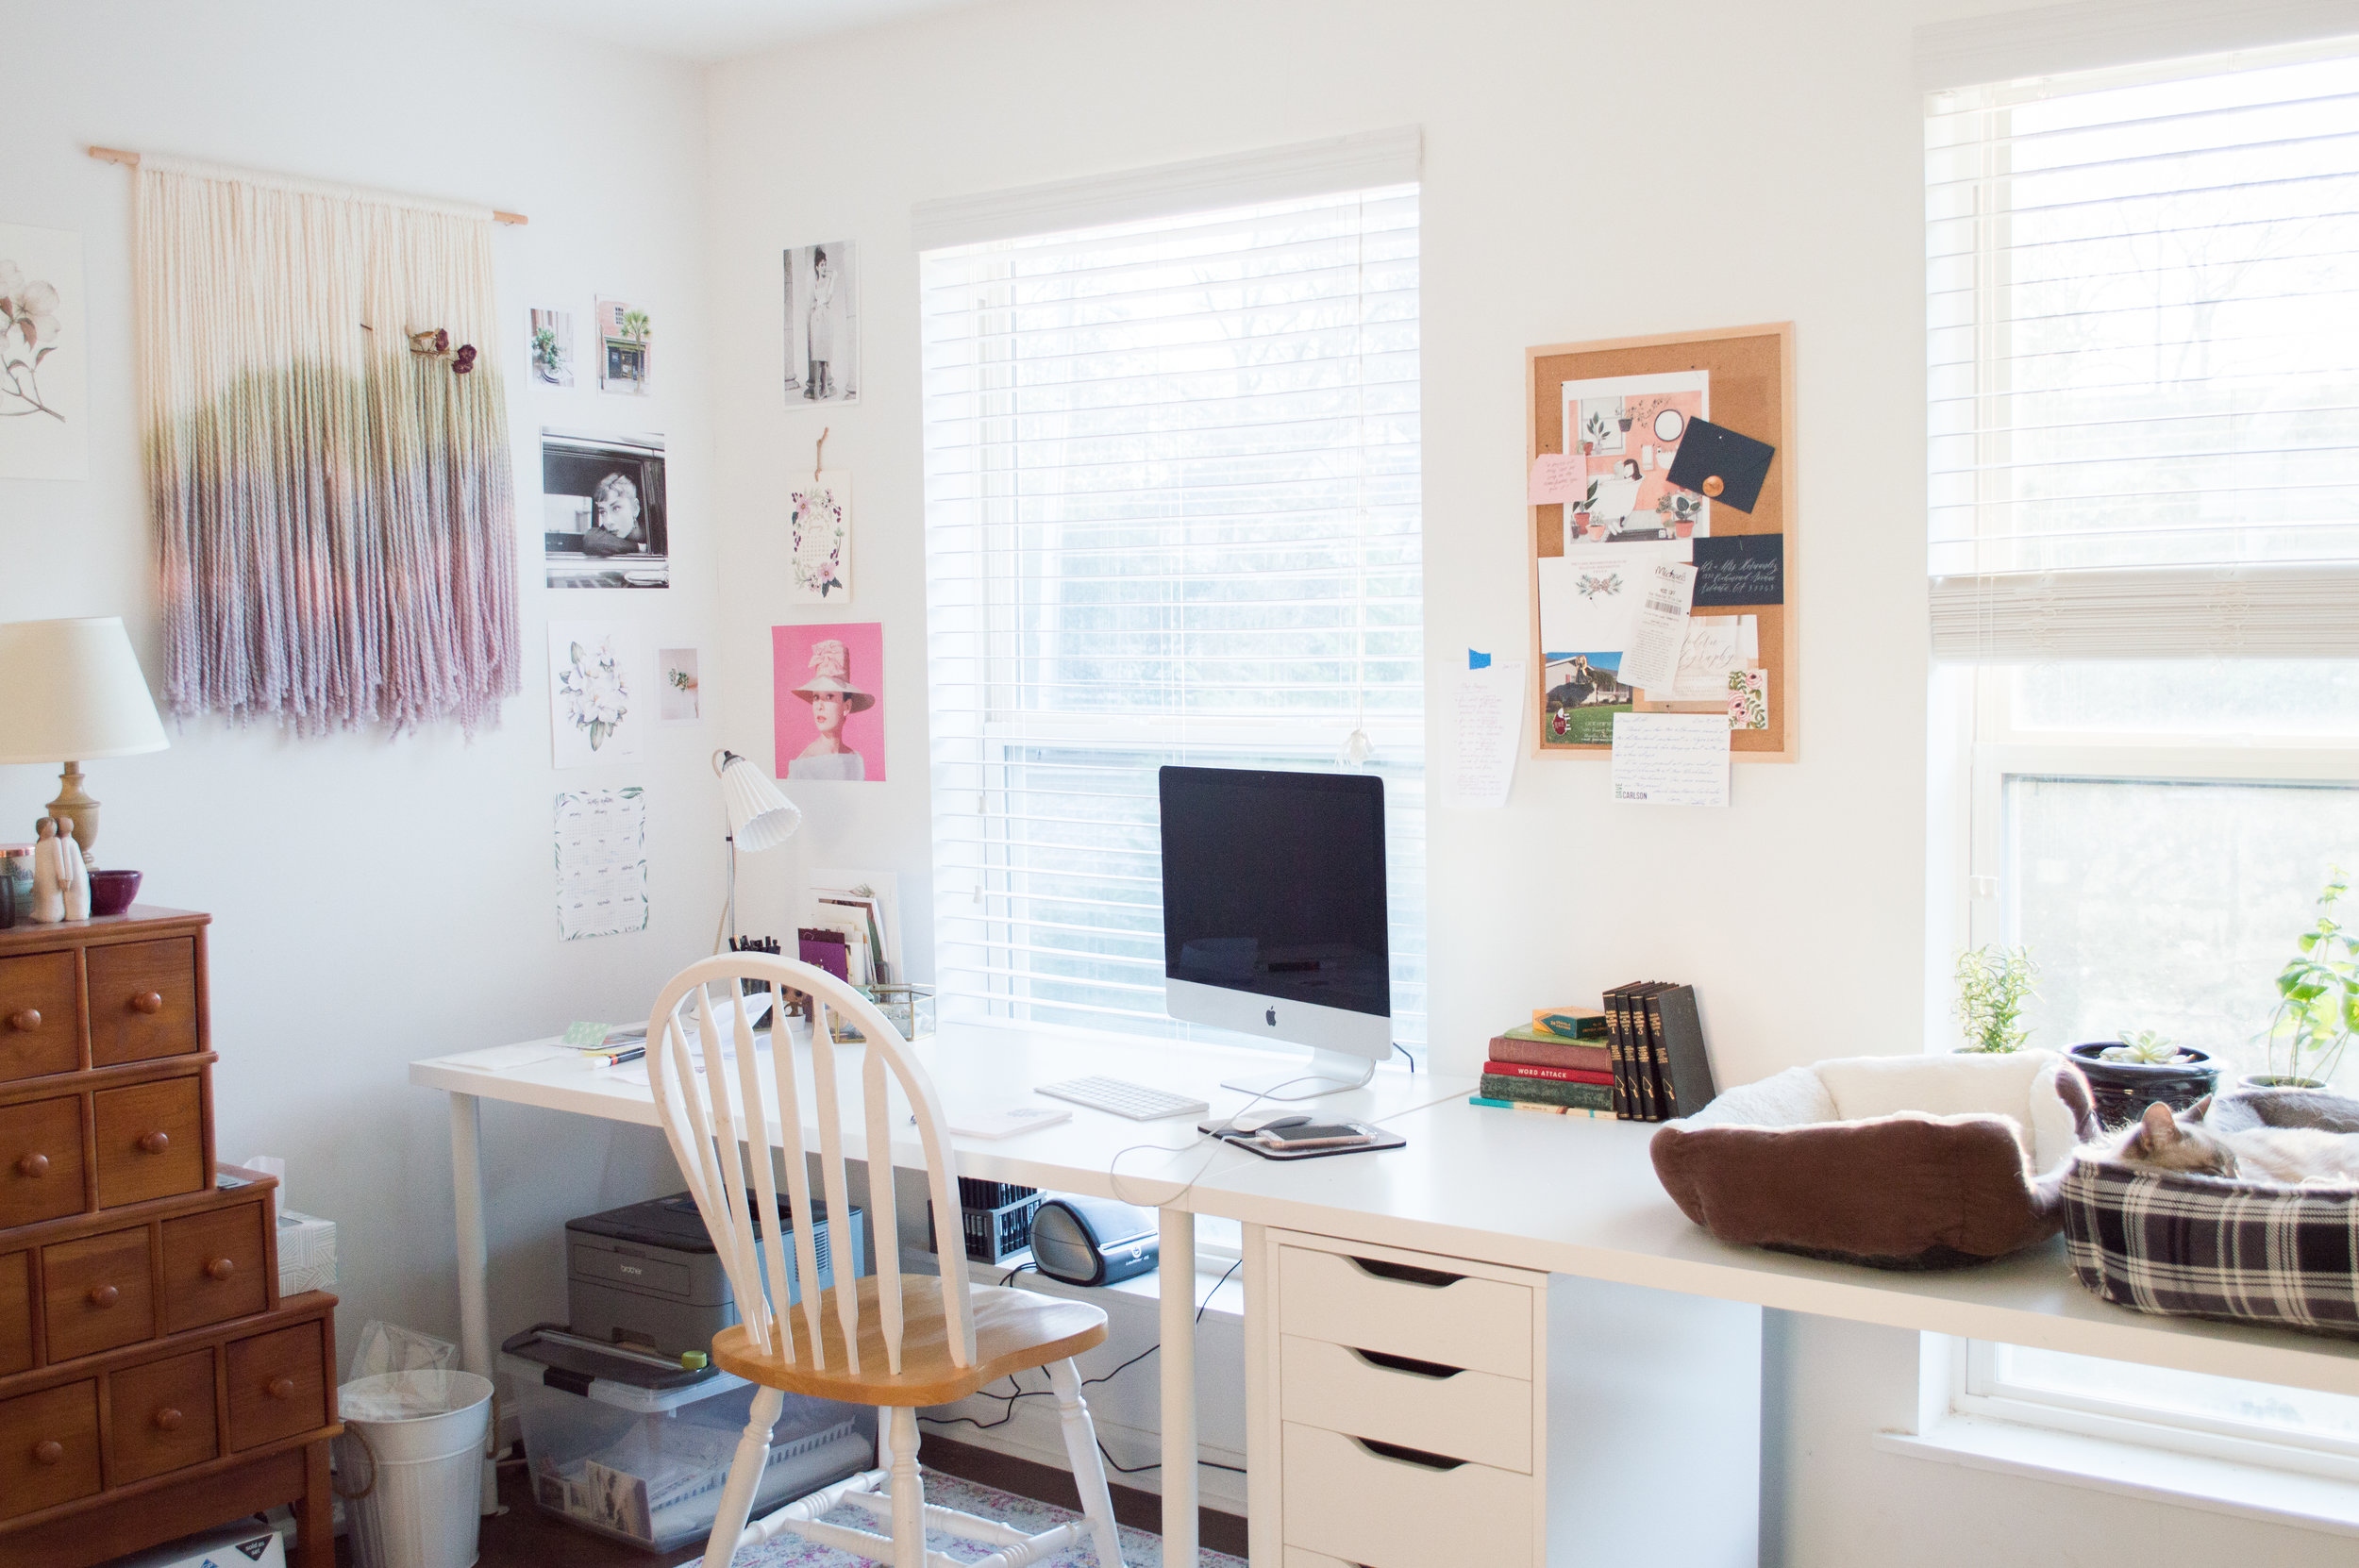 marietta calligrapher, studio photo, work from home, home office inspiration